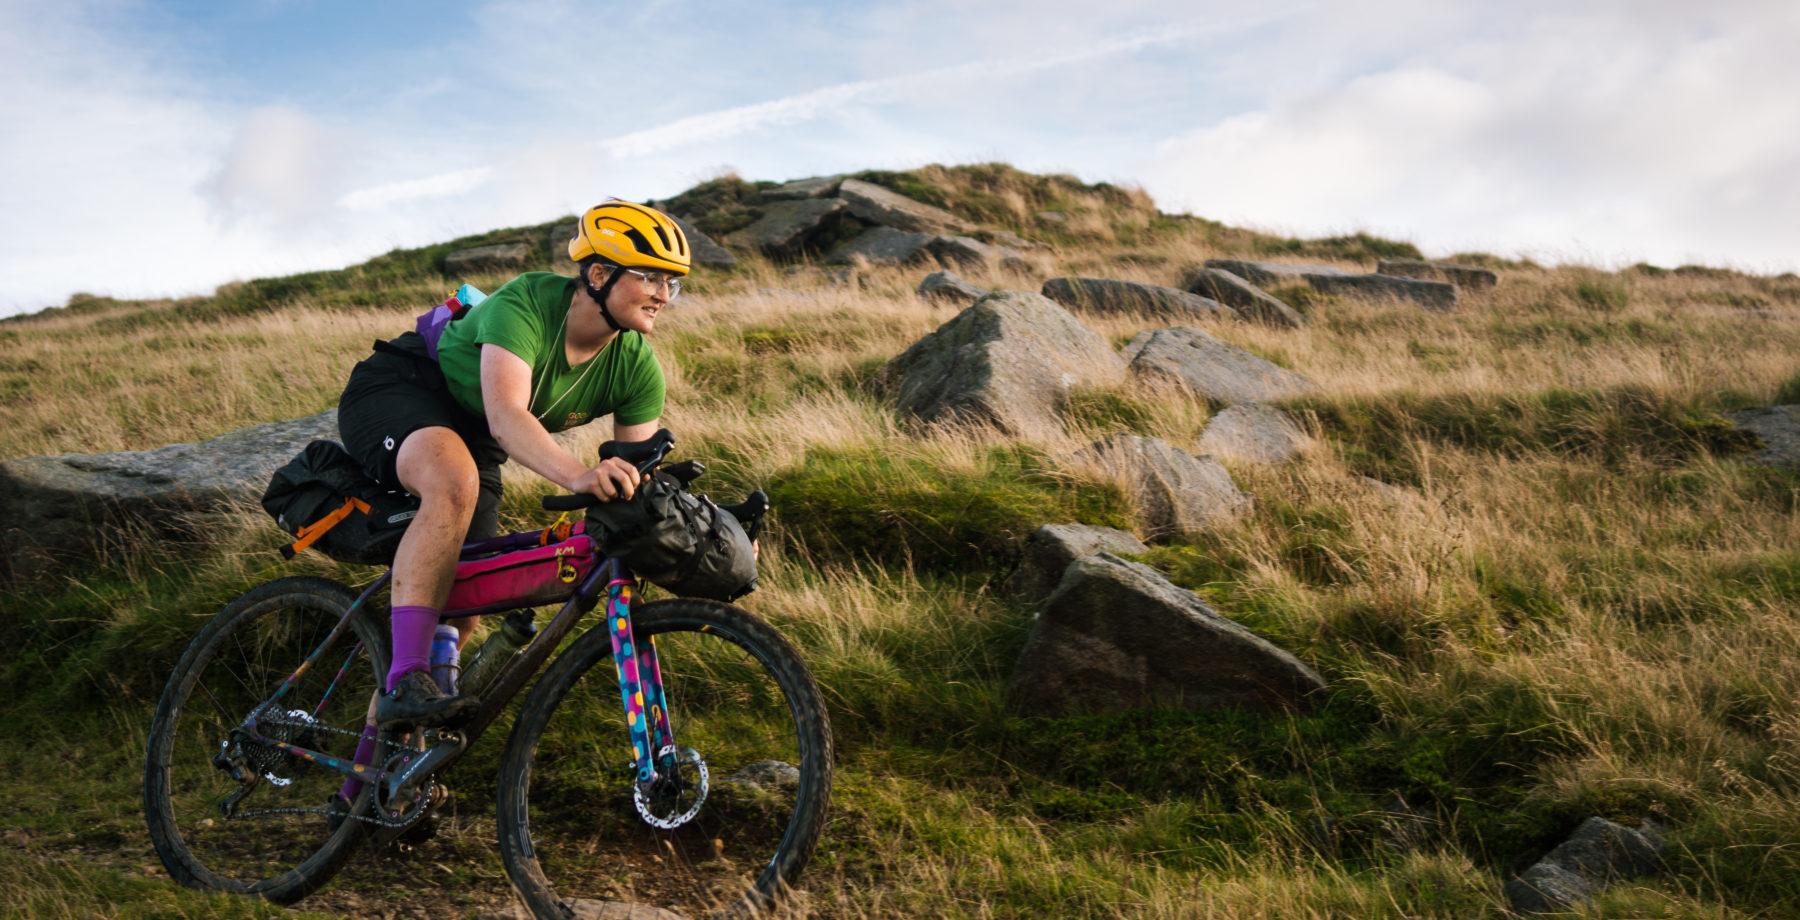 Mercredi Bikes and Katherine Moore